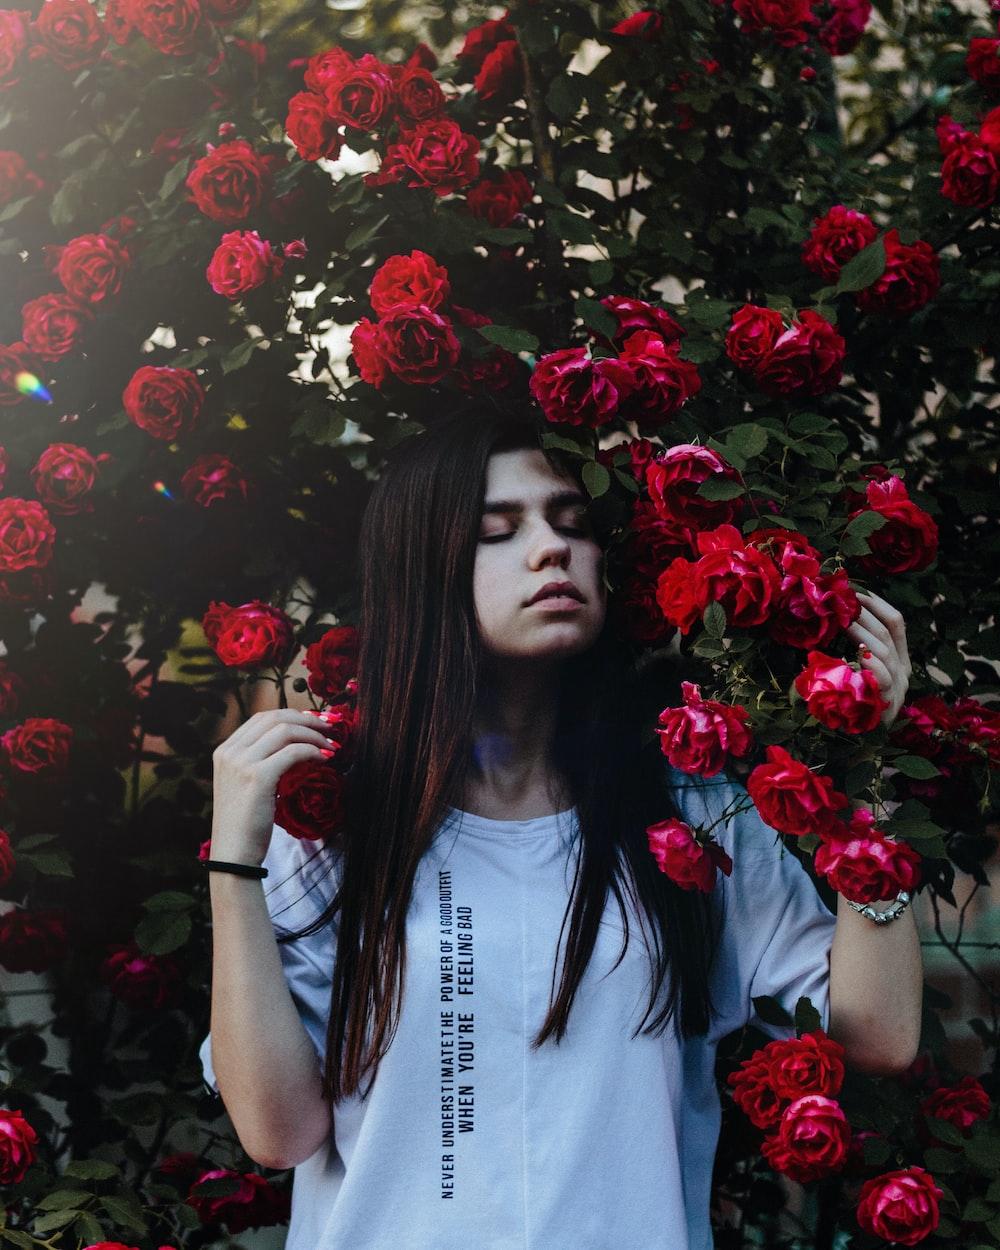 woman wearing grey shirt beside red rose flowers